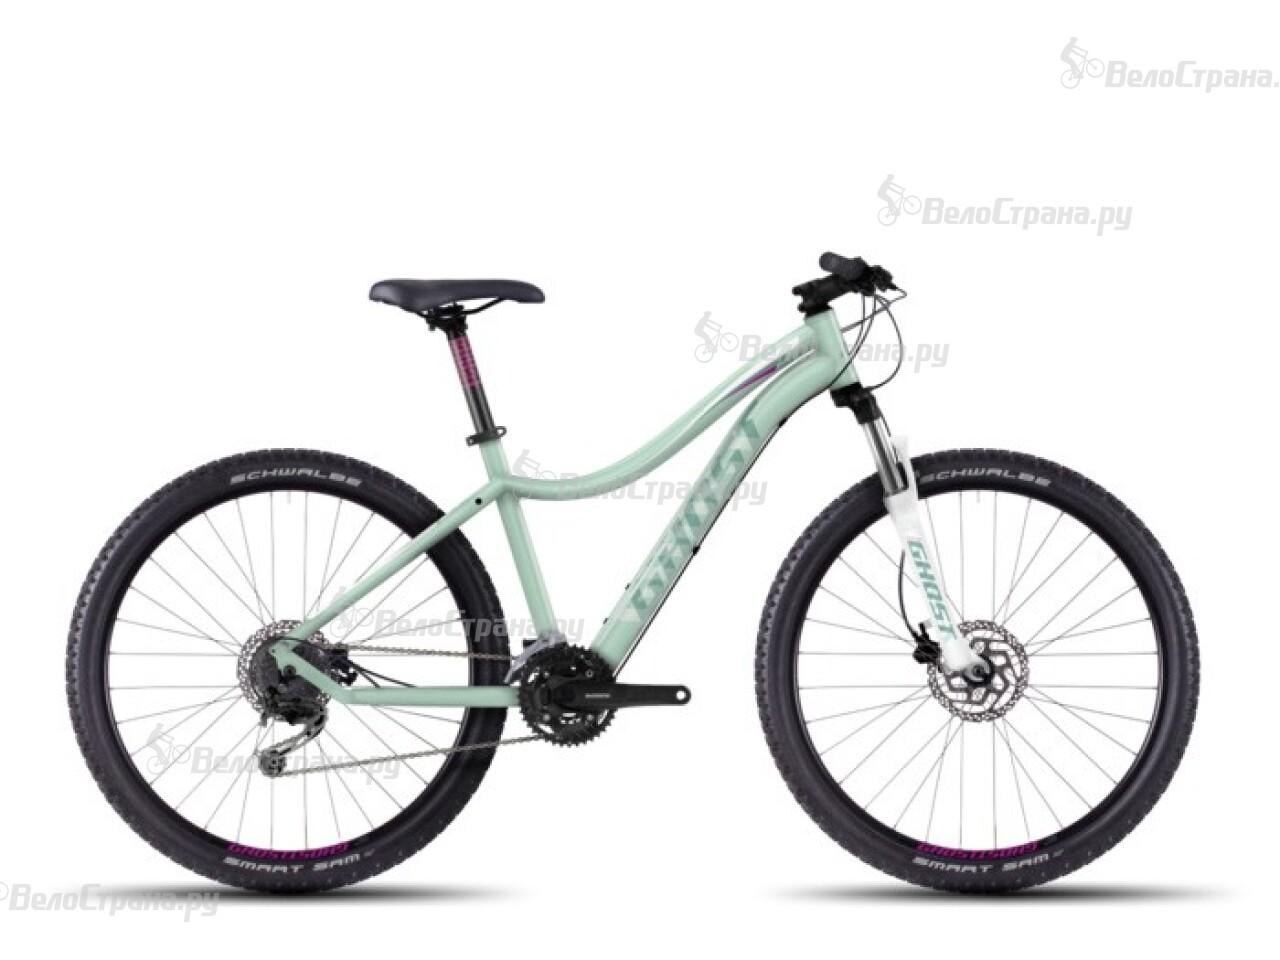 Велосипед Ghost Lanao 3 (2016) велосипед ghost lanao 3 2015